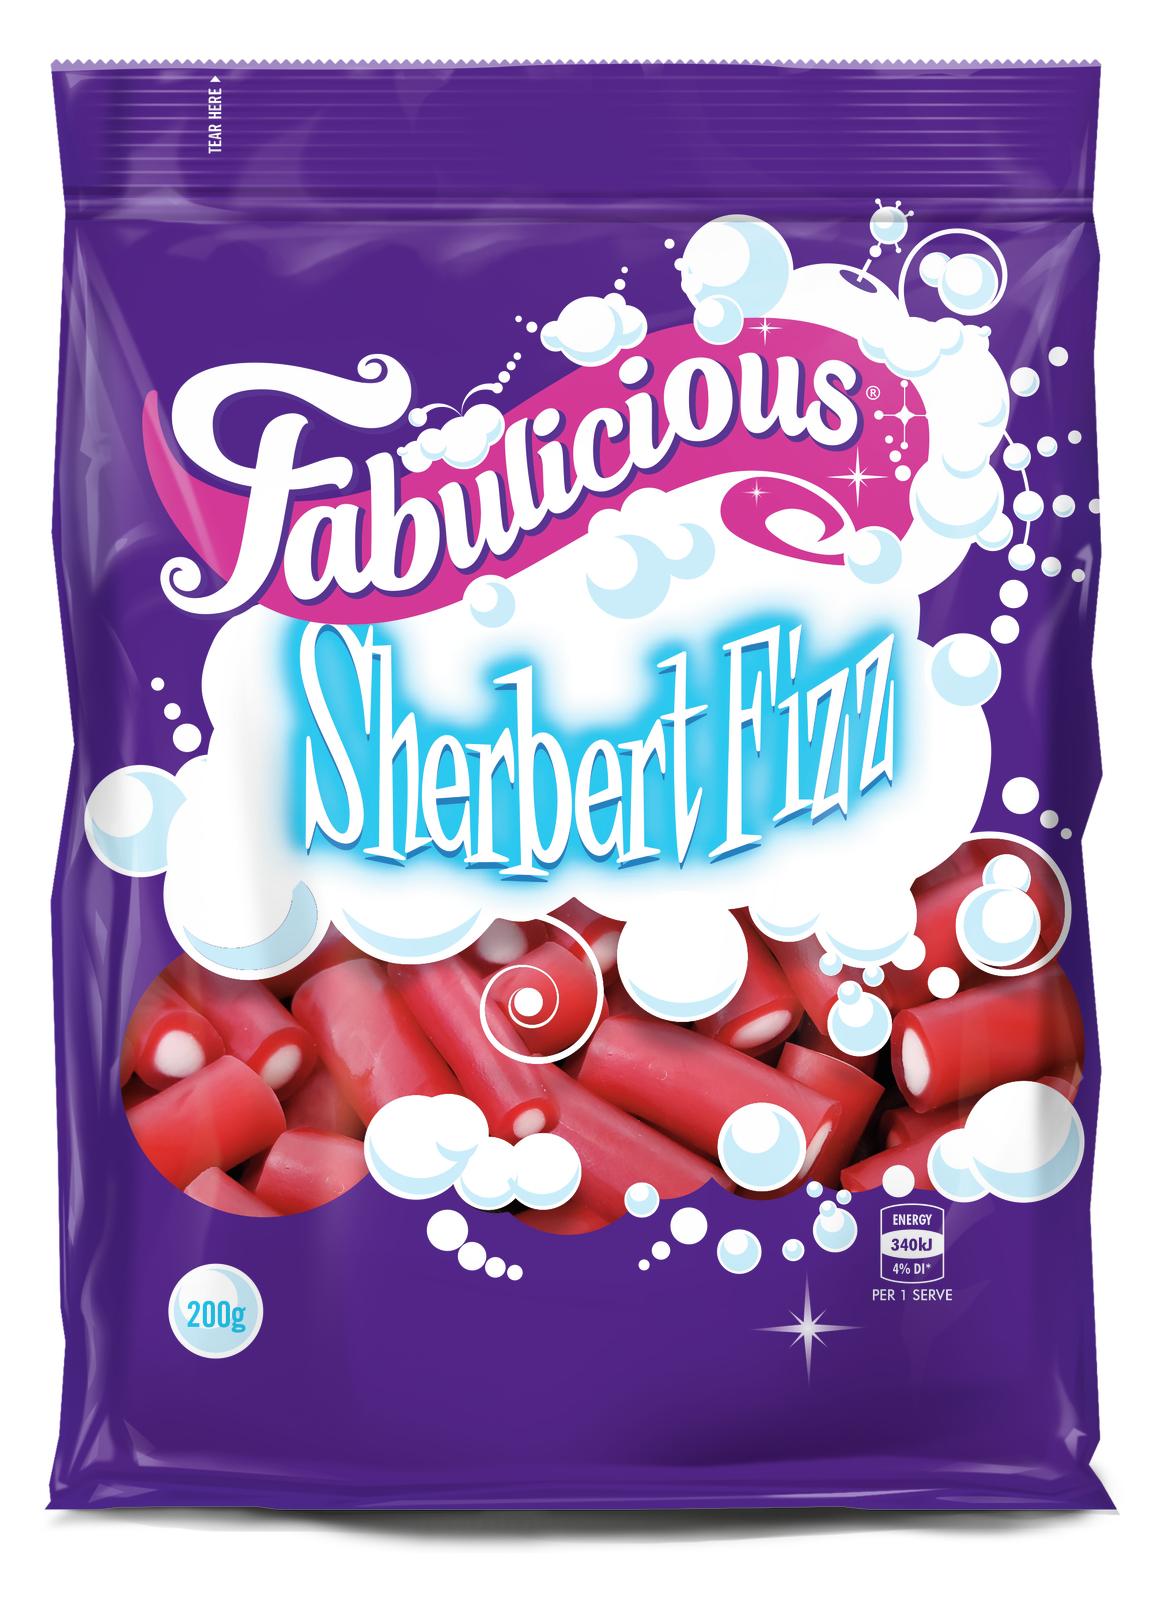 RJs Fabulicious Sherbert Fizz (200g) image